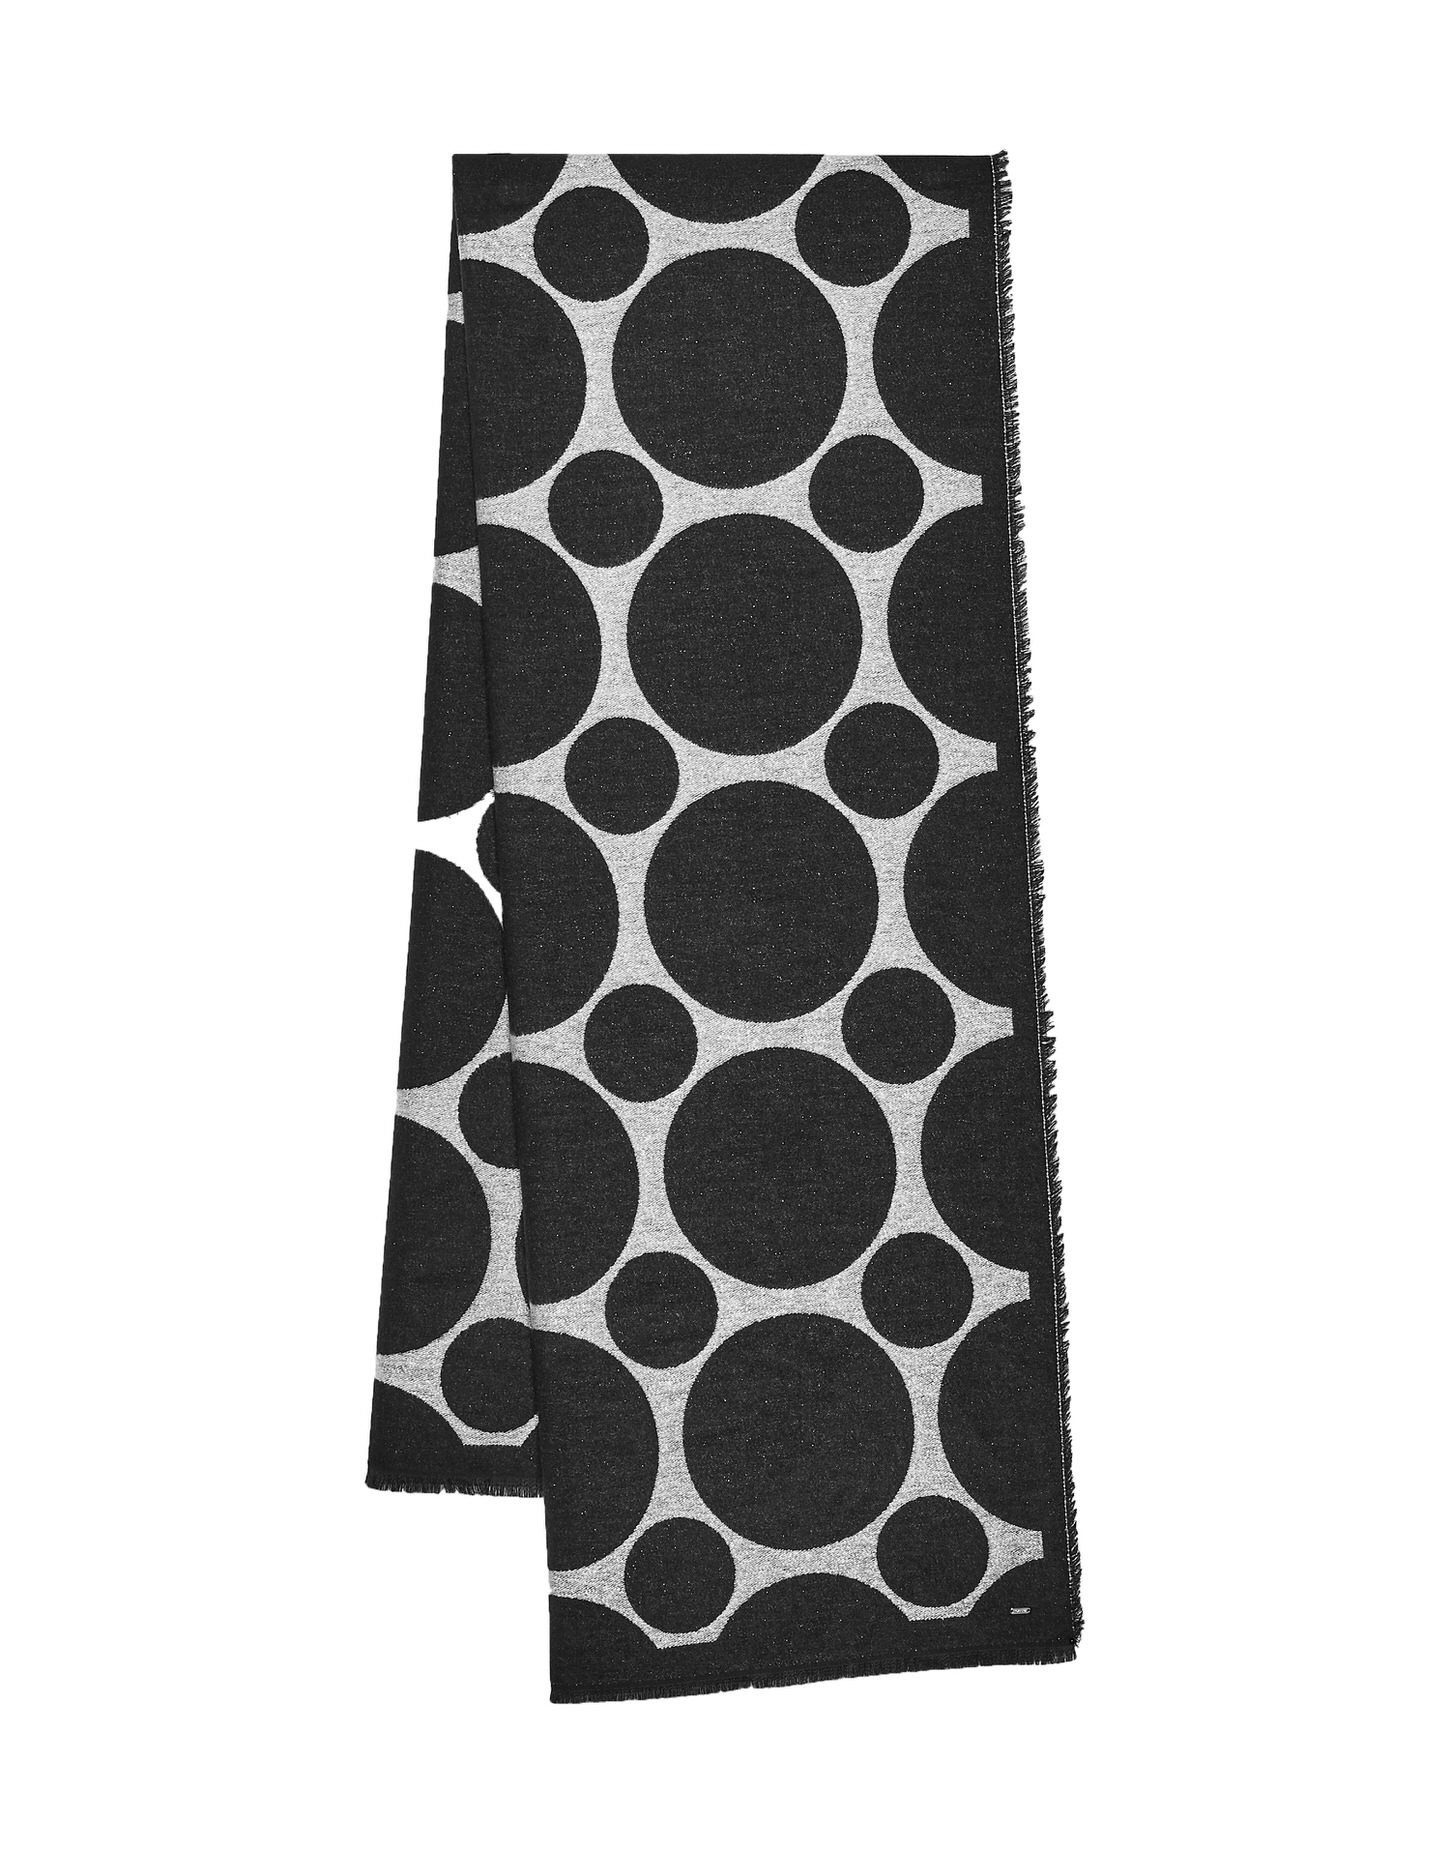 Adots scarf